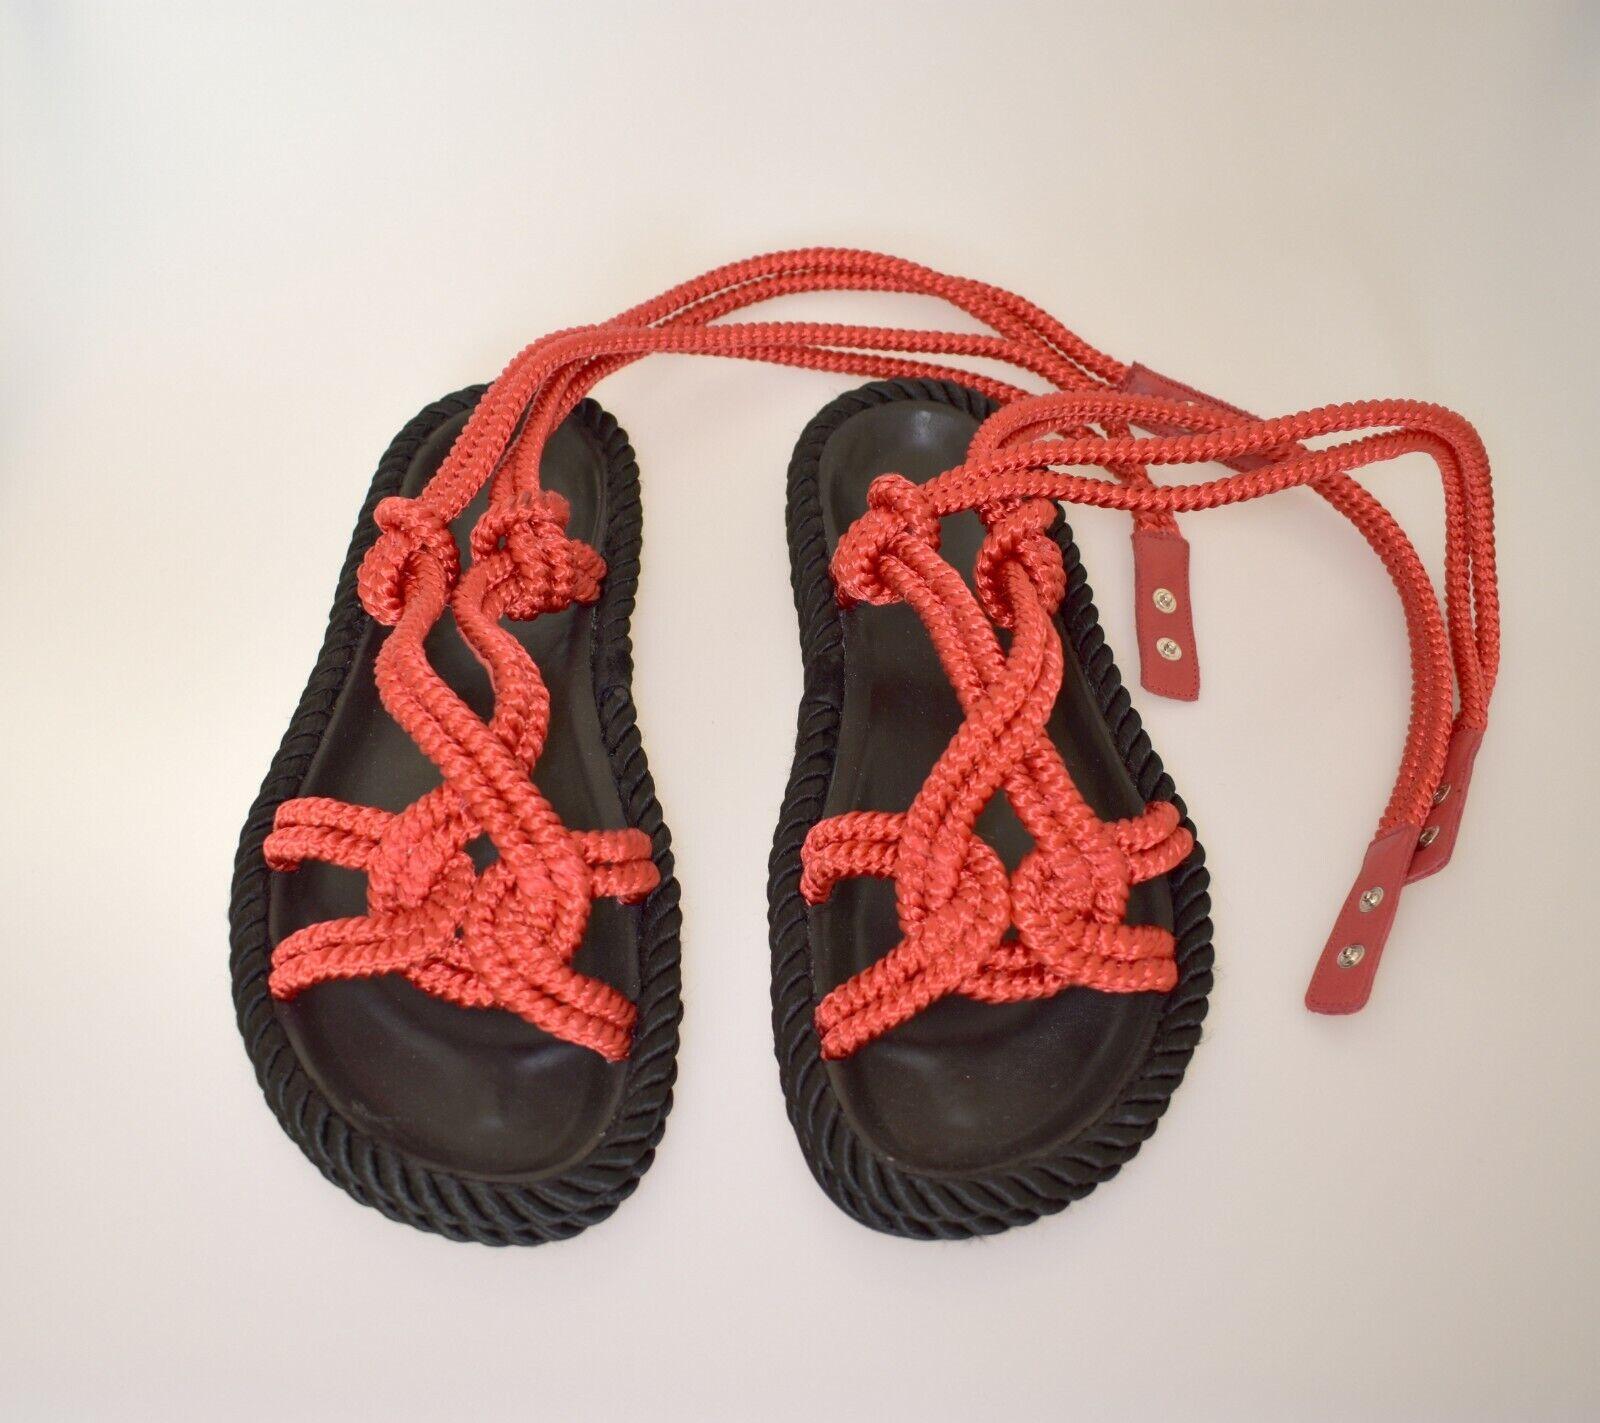 ISABEL MARANT sandals Sandalen rot schwarz leather leder Kordel CORDS Römersanda